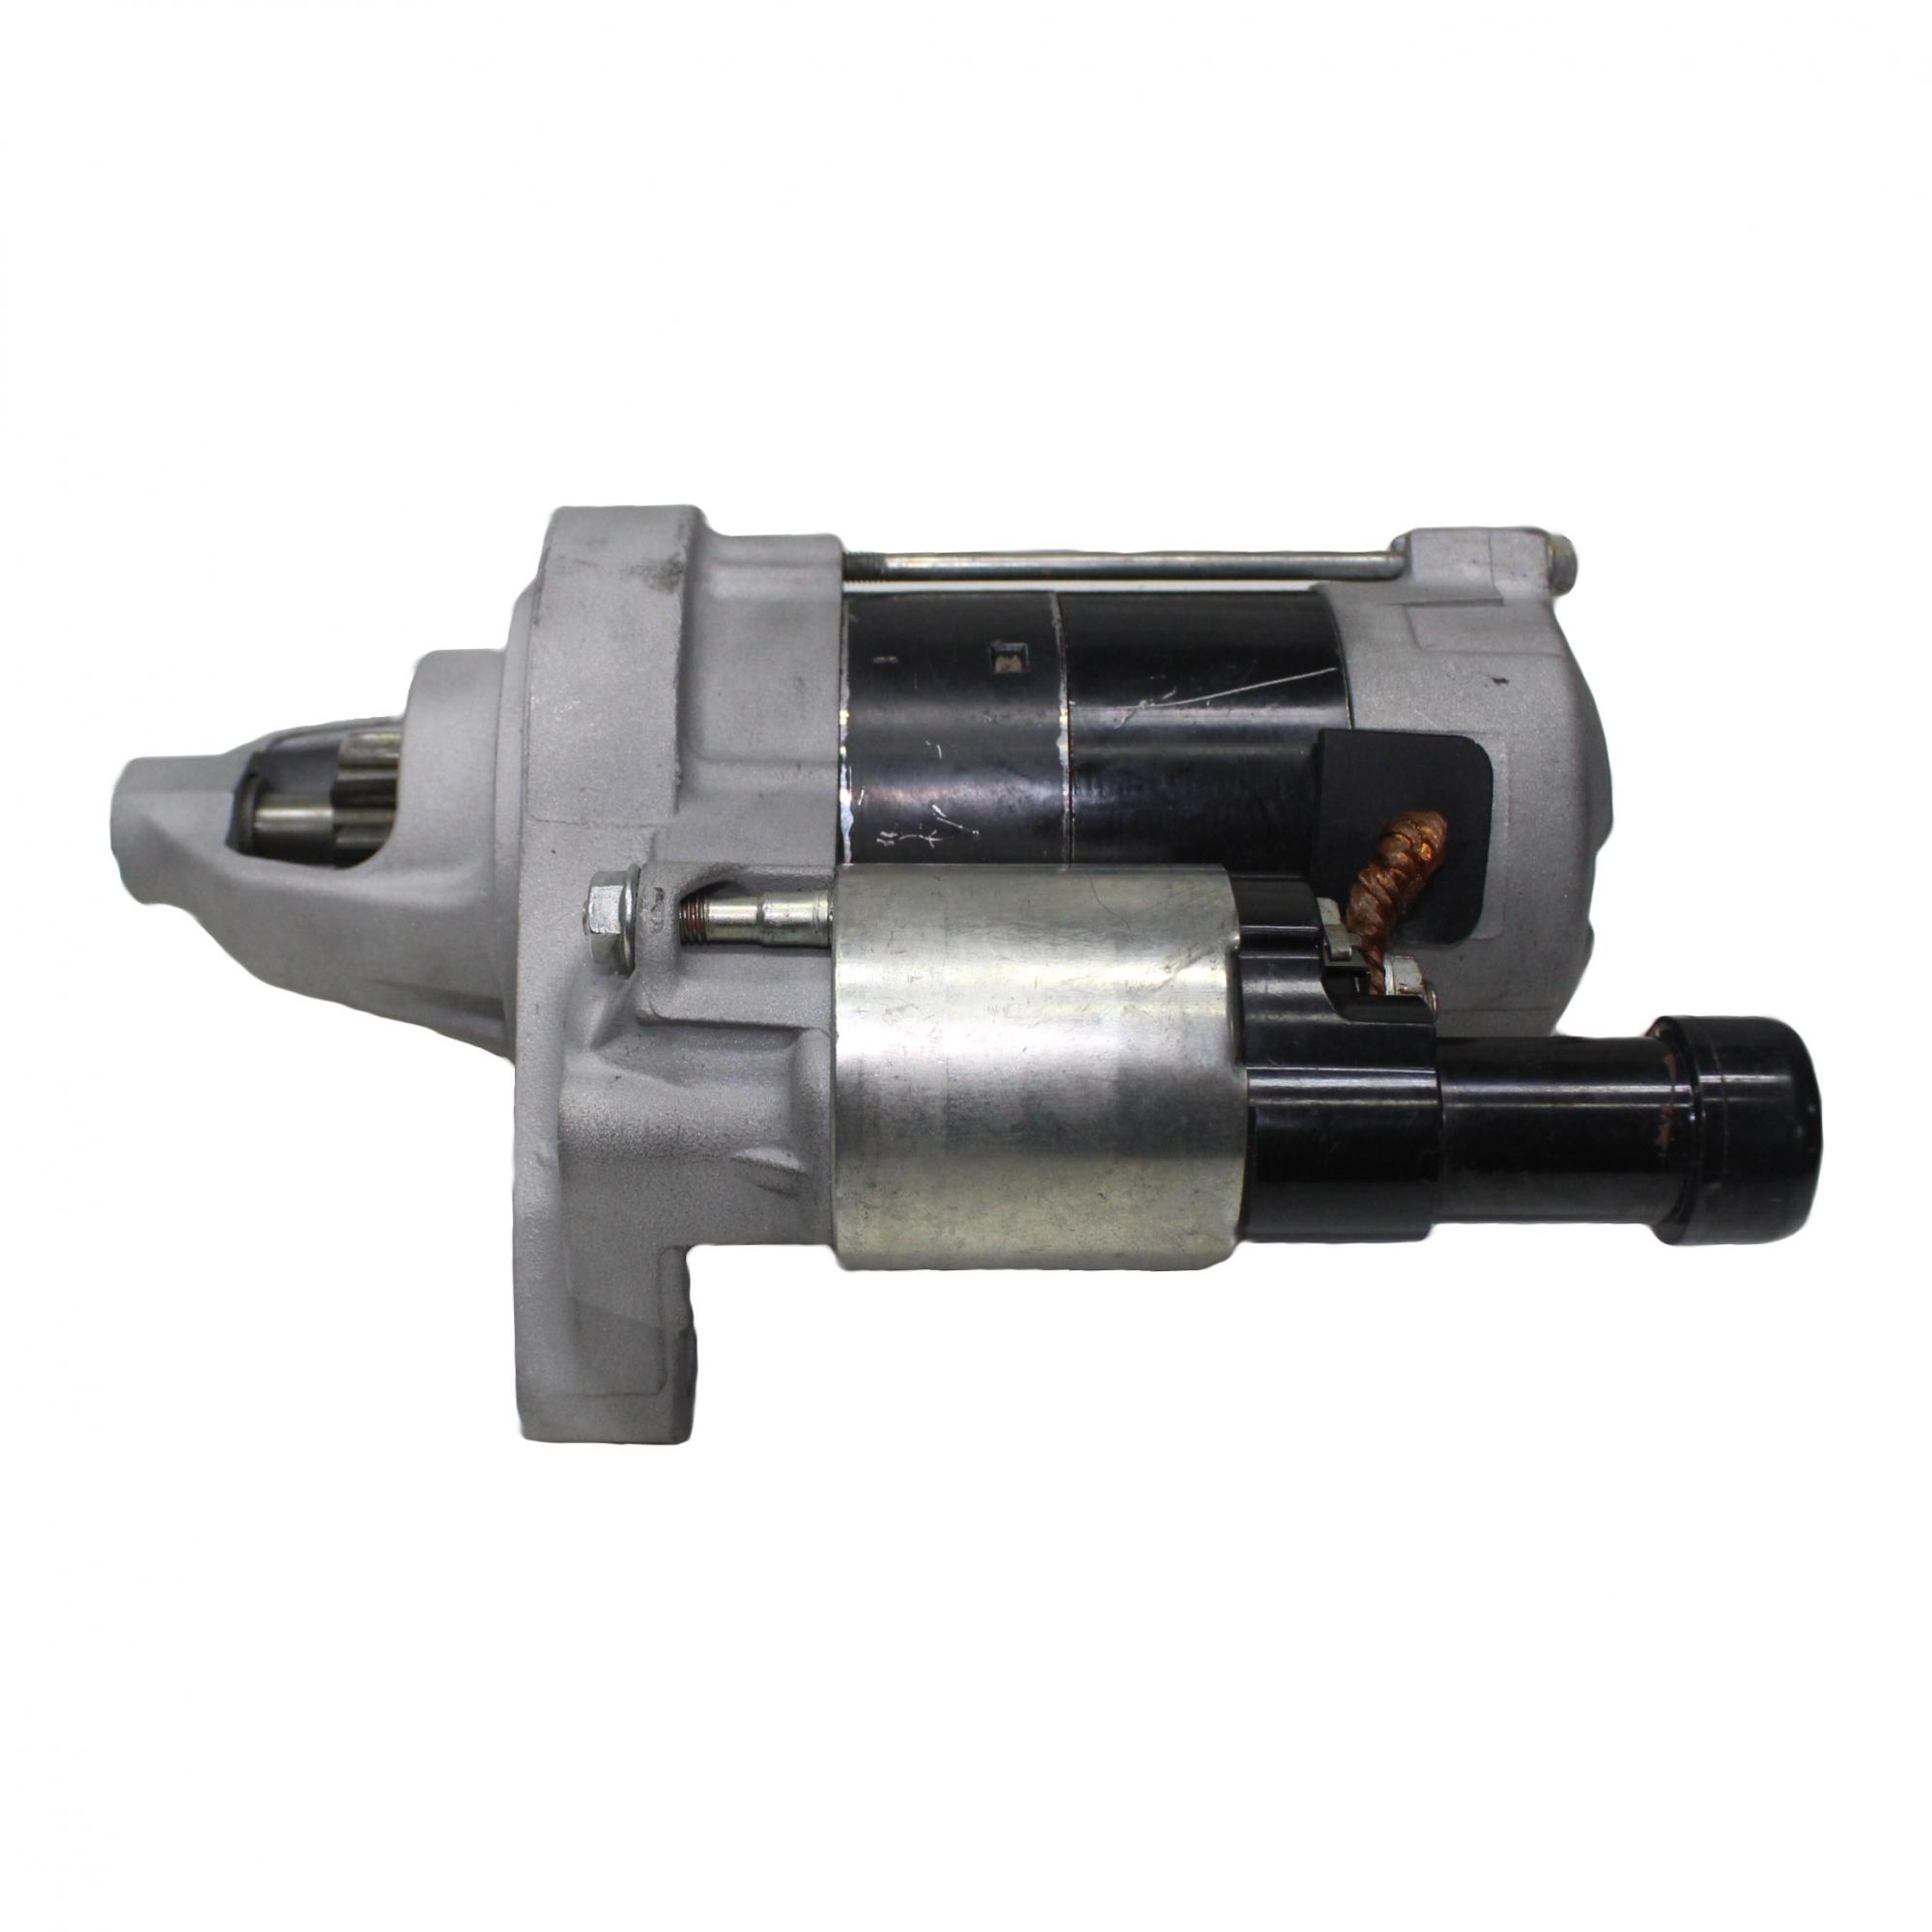 Motor de Arranque Partida Honda Civic 06...09 4280005290